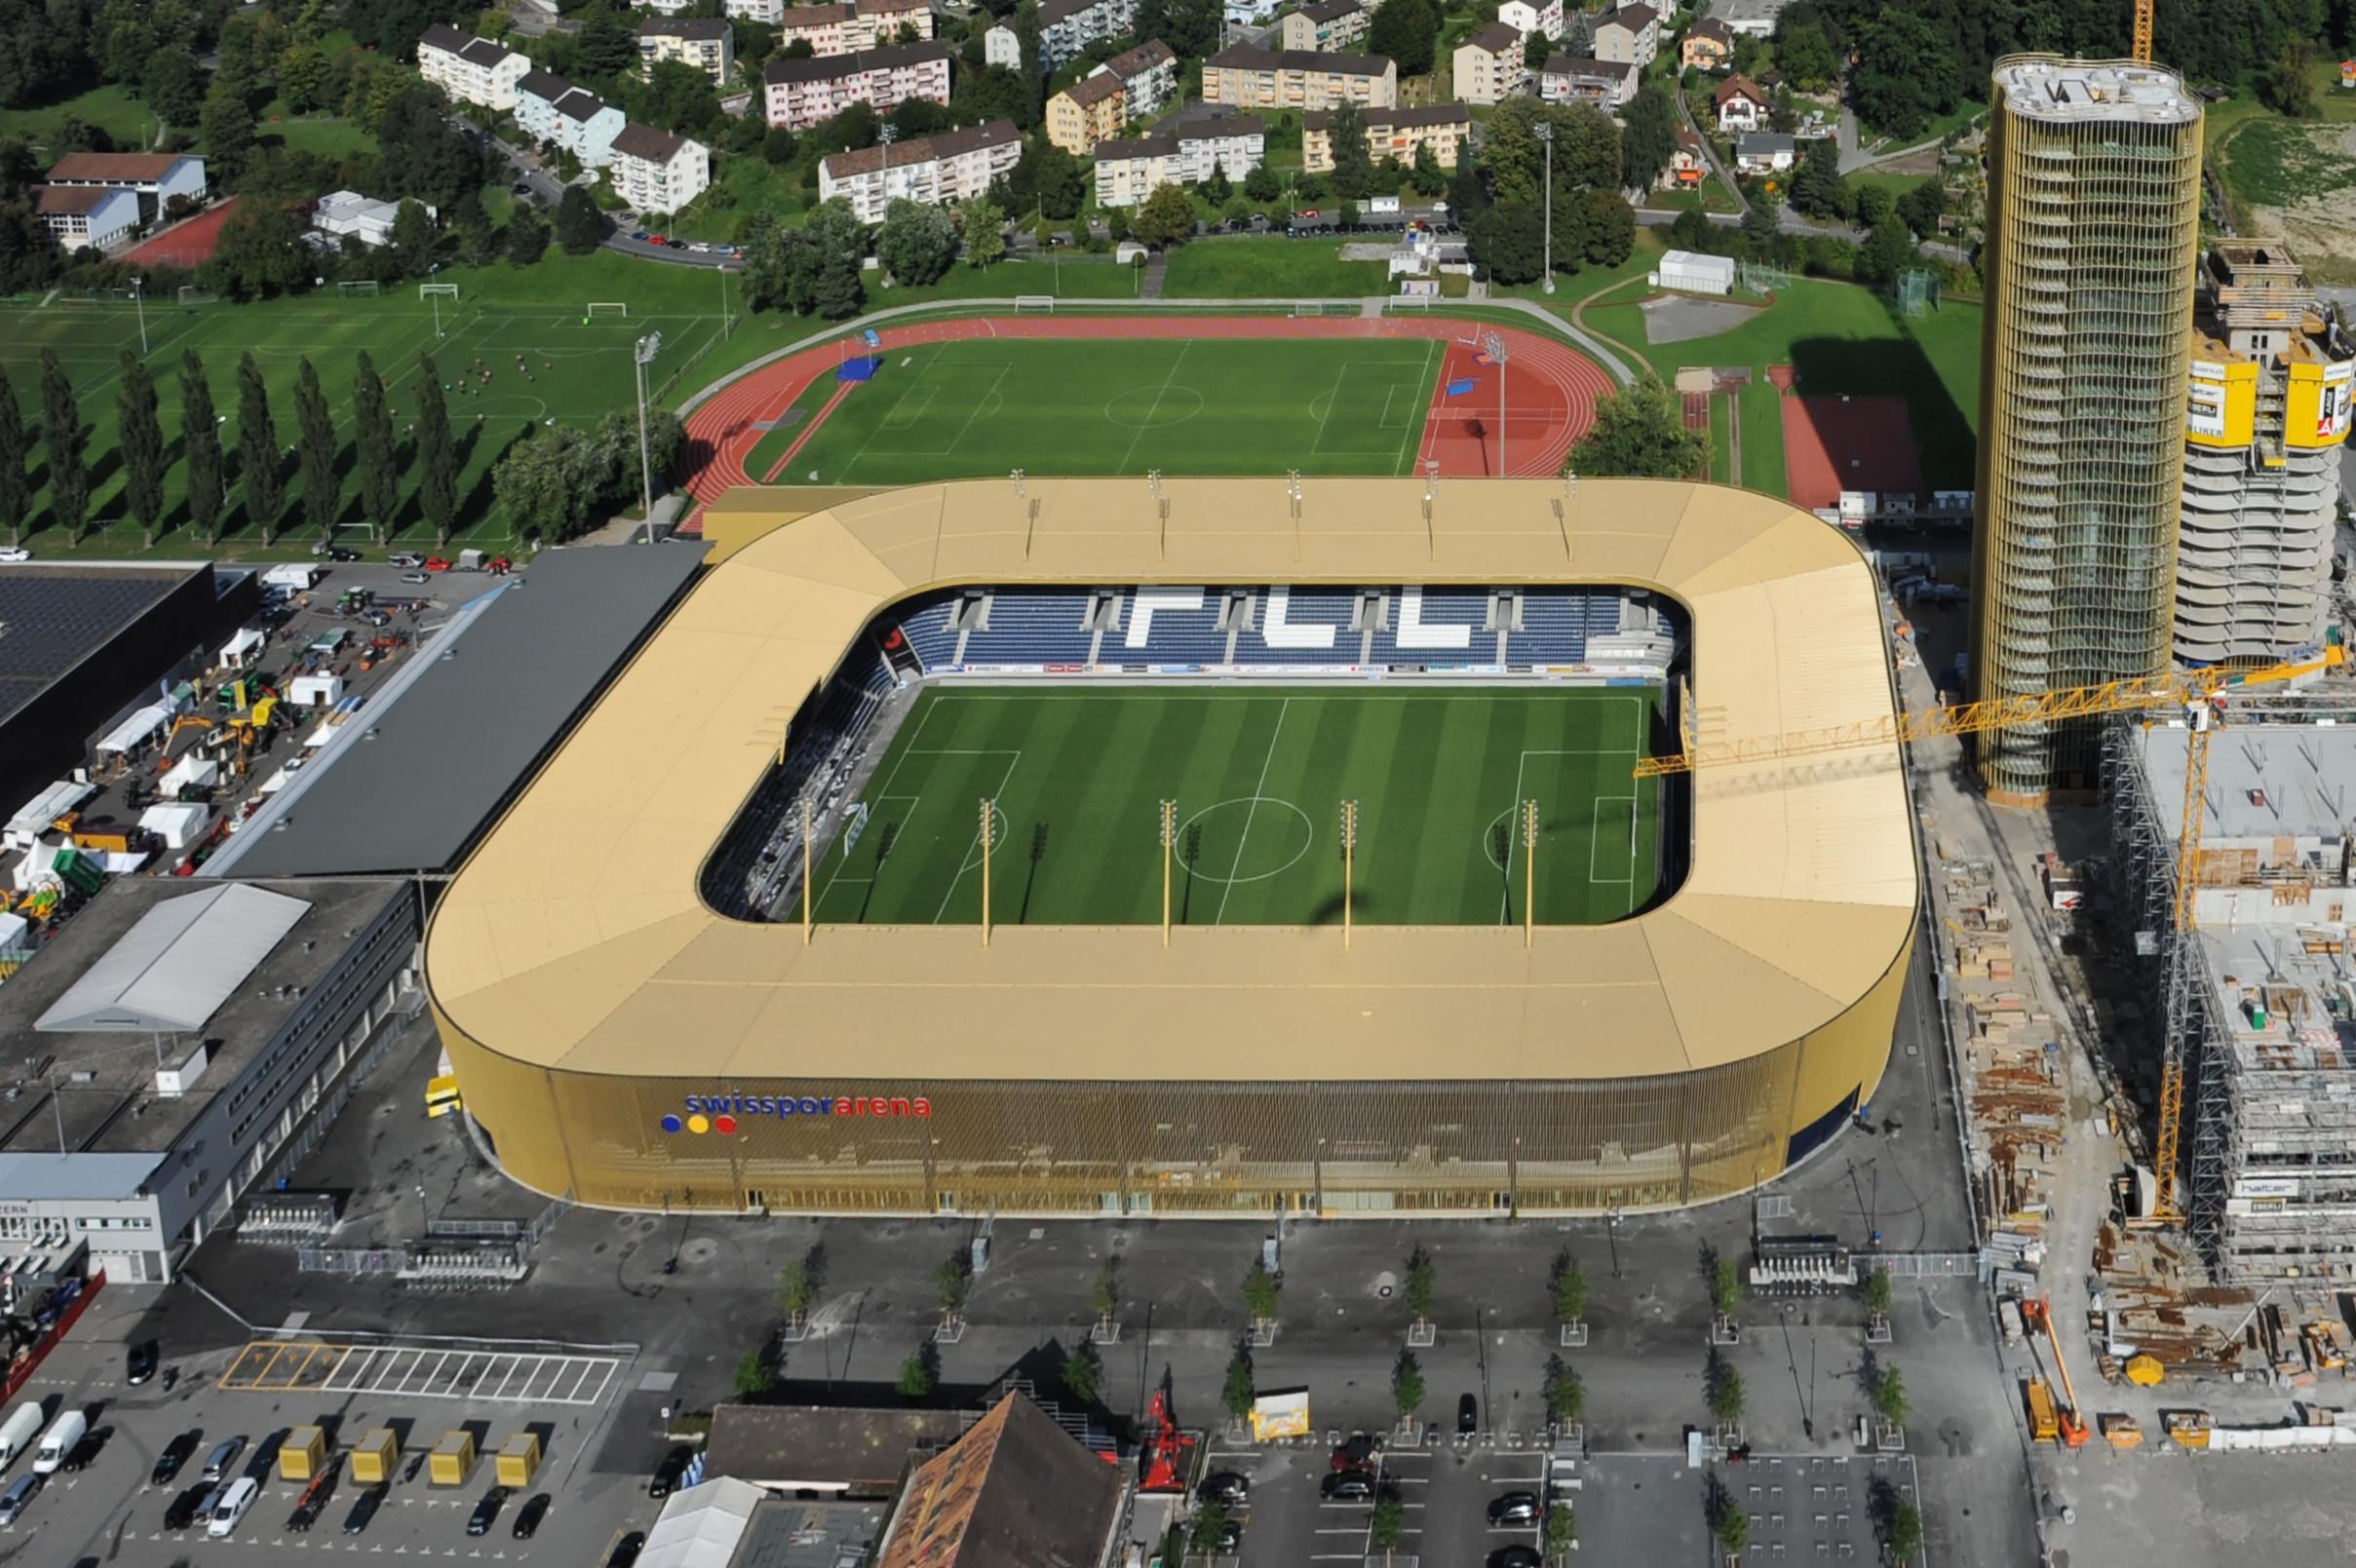 Wohntürme 1+2 Swisspor Arena Allmend